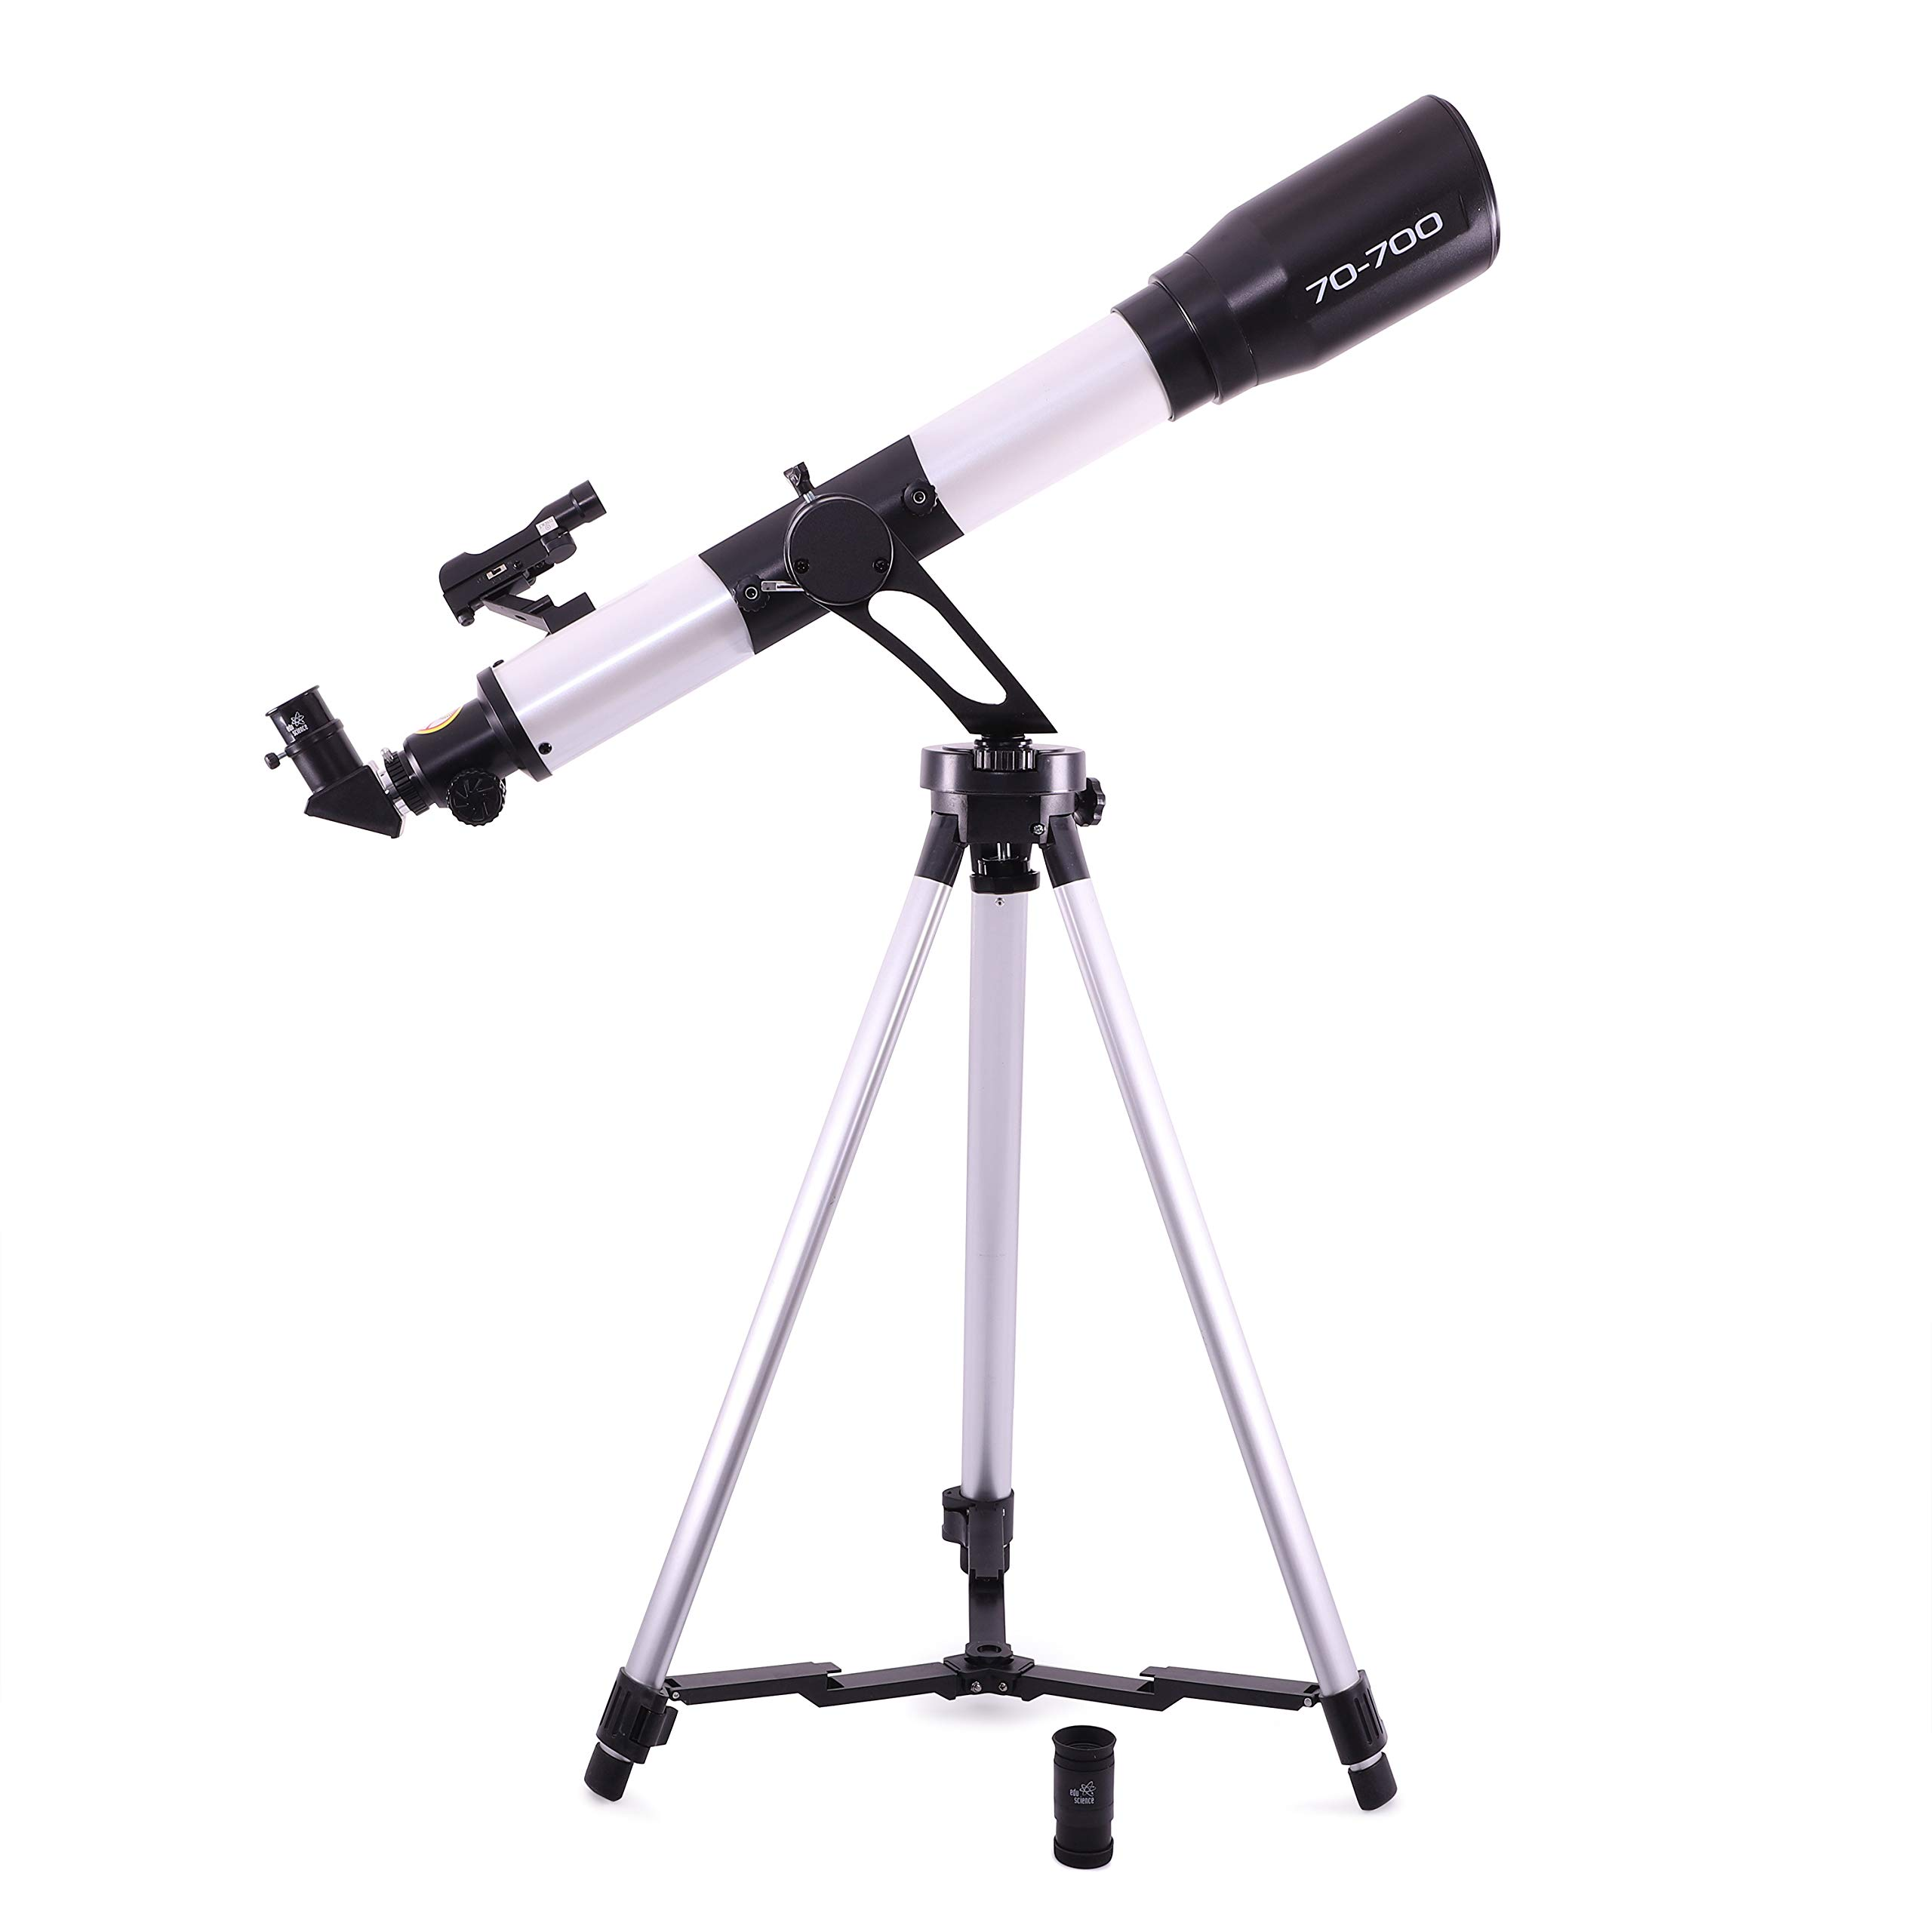 Edu Science 70Mm AZ Sm Refactor Telescope, Black